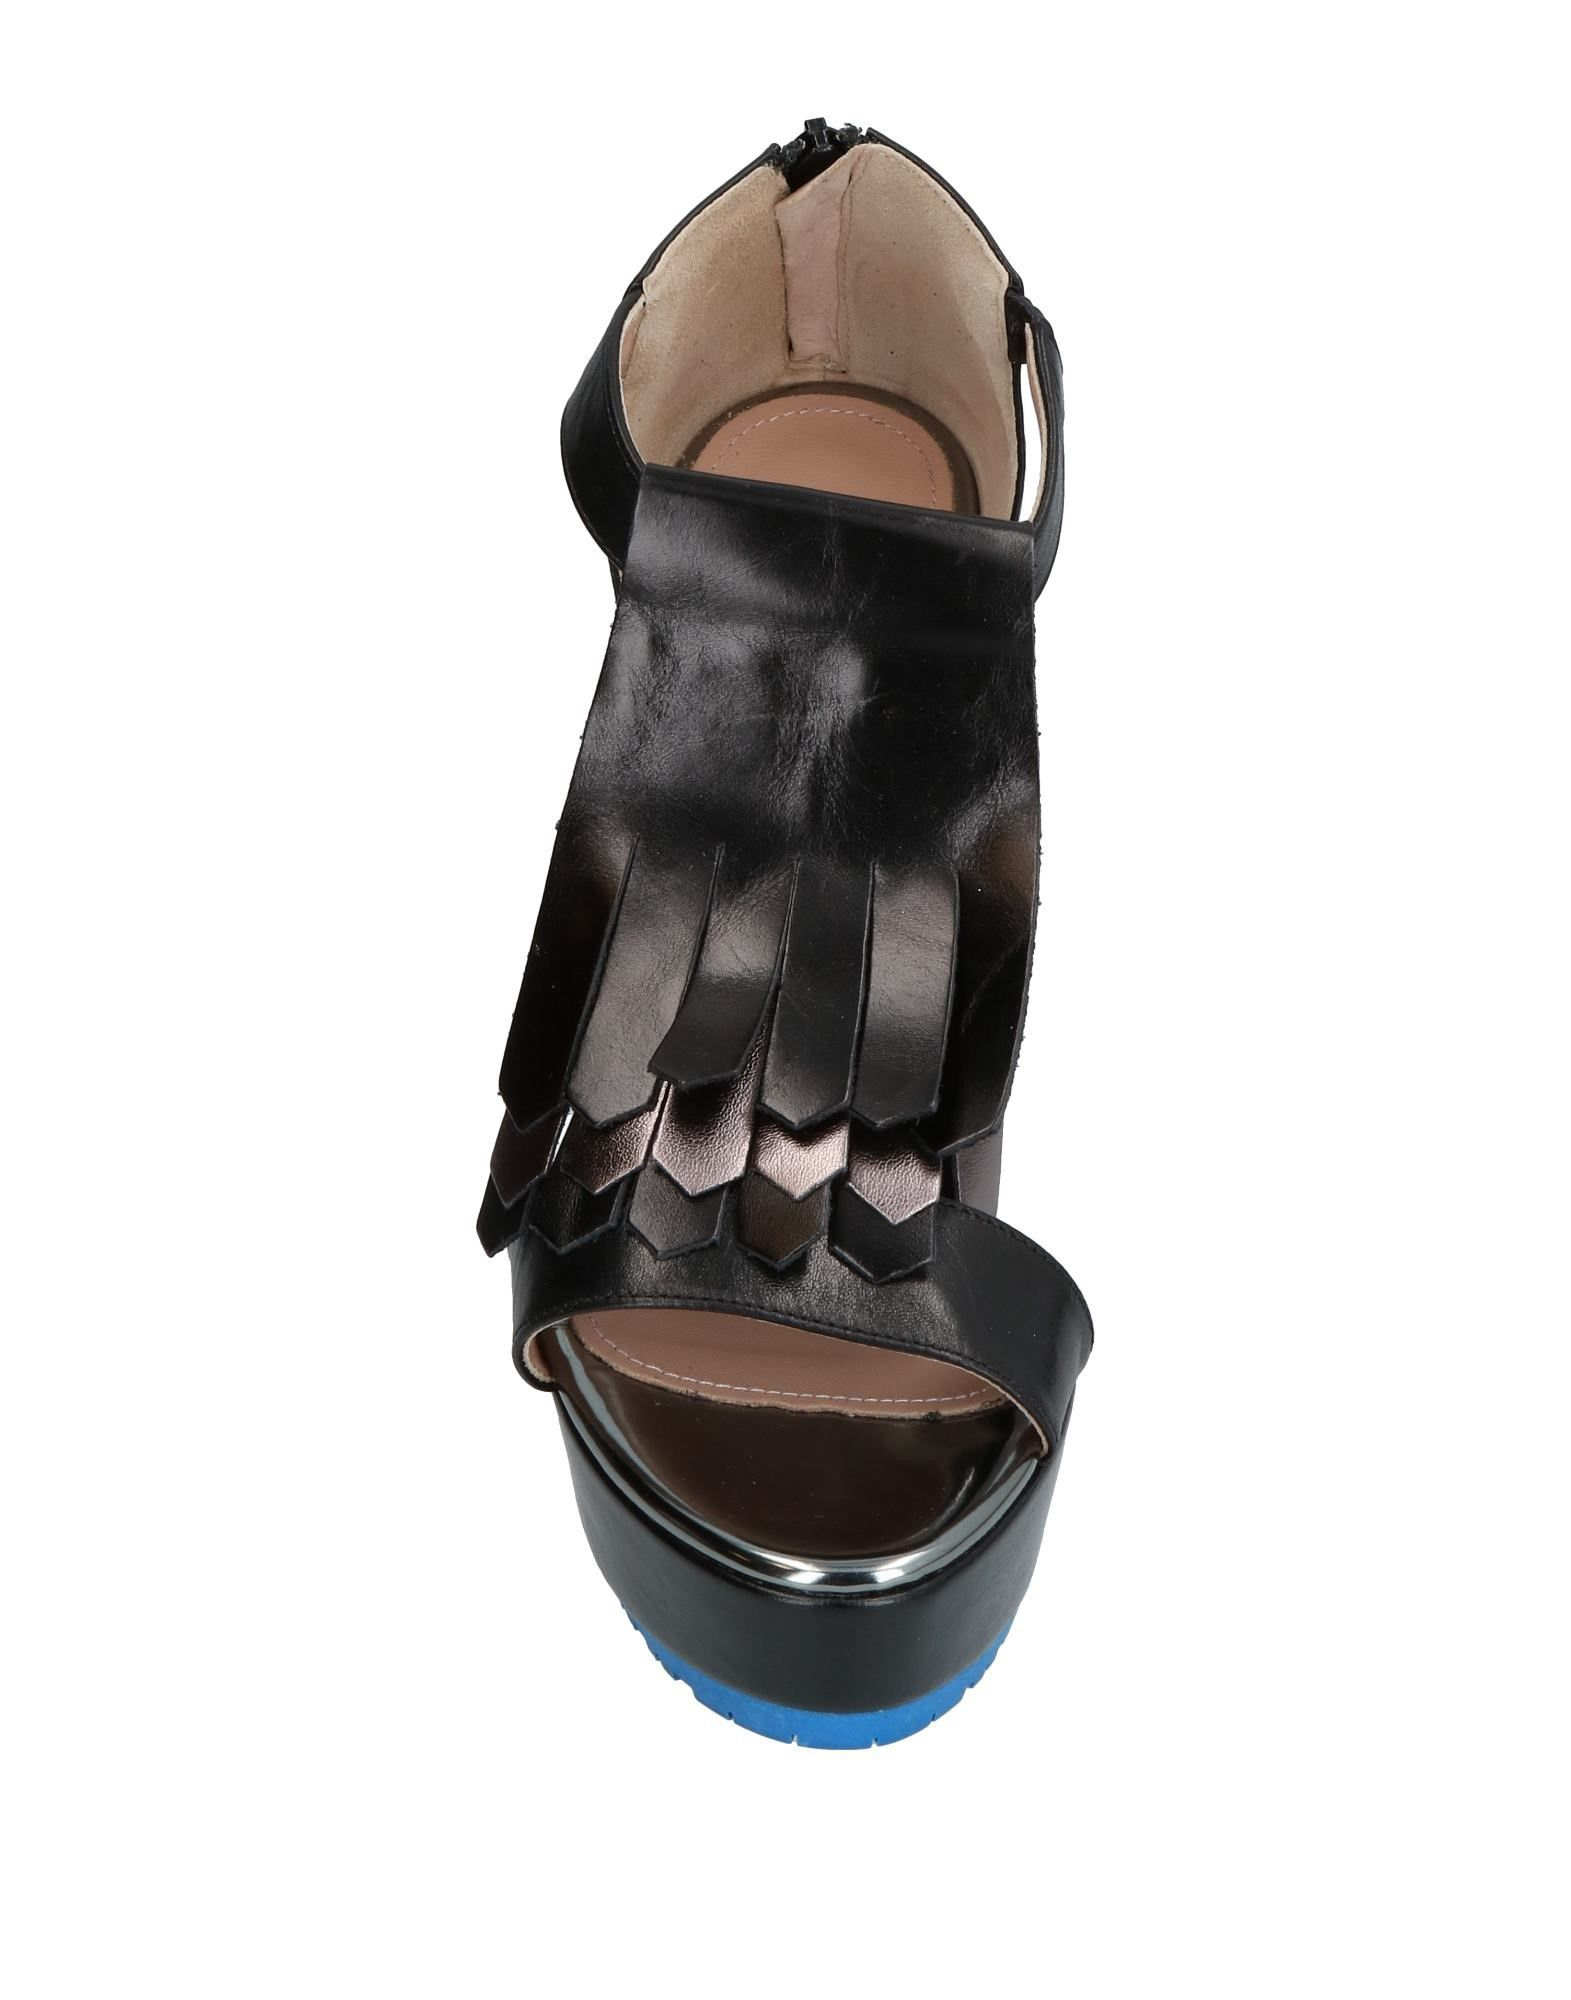 Tipe E Tacchi Sandalen Damen  11330196XH Gute Qualität beliebte Schuhe